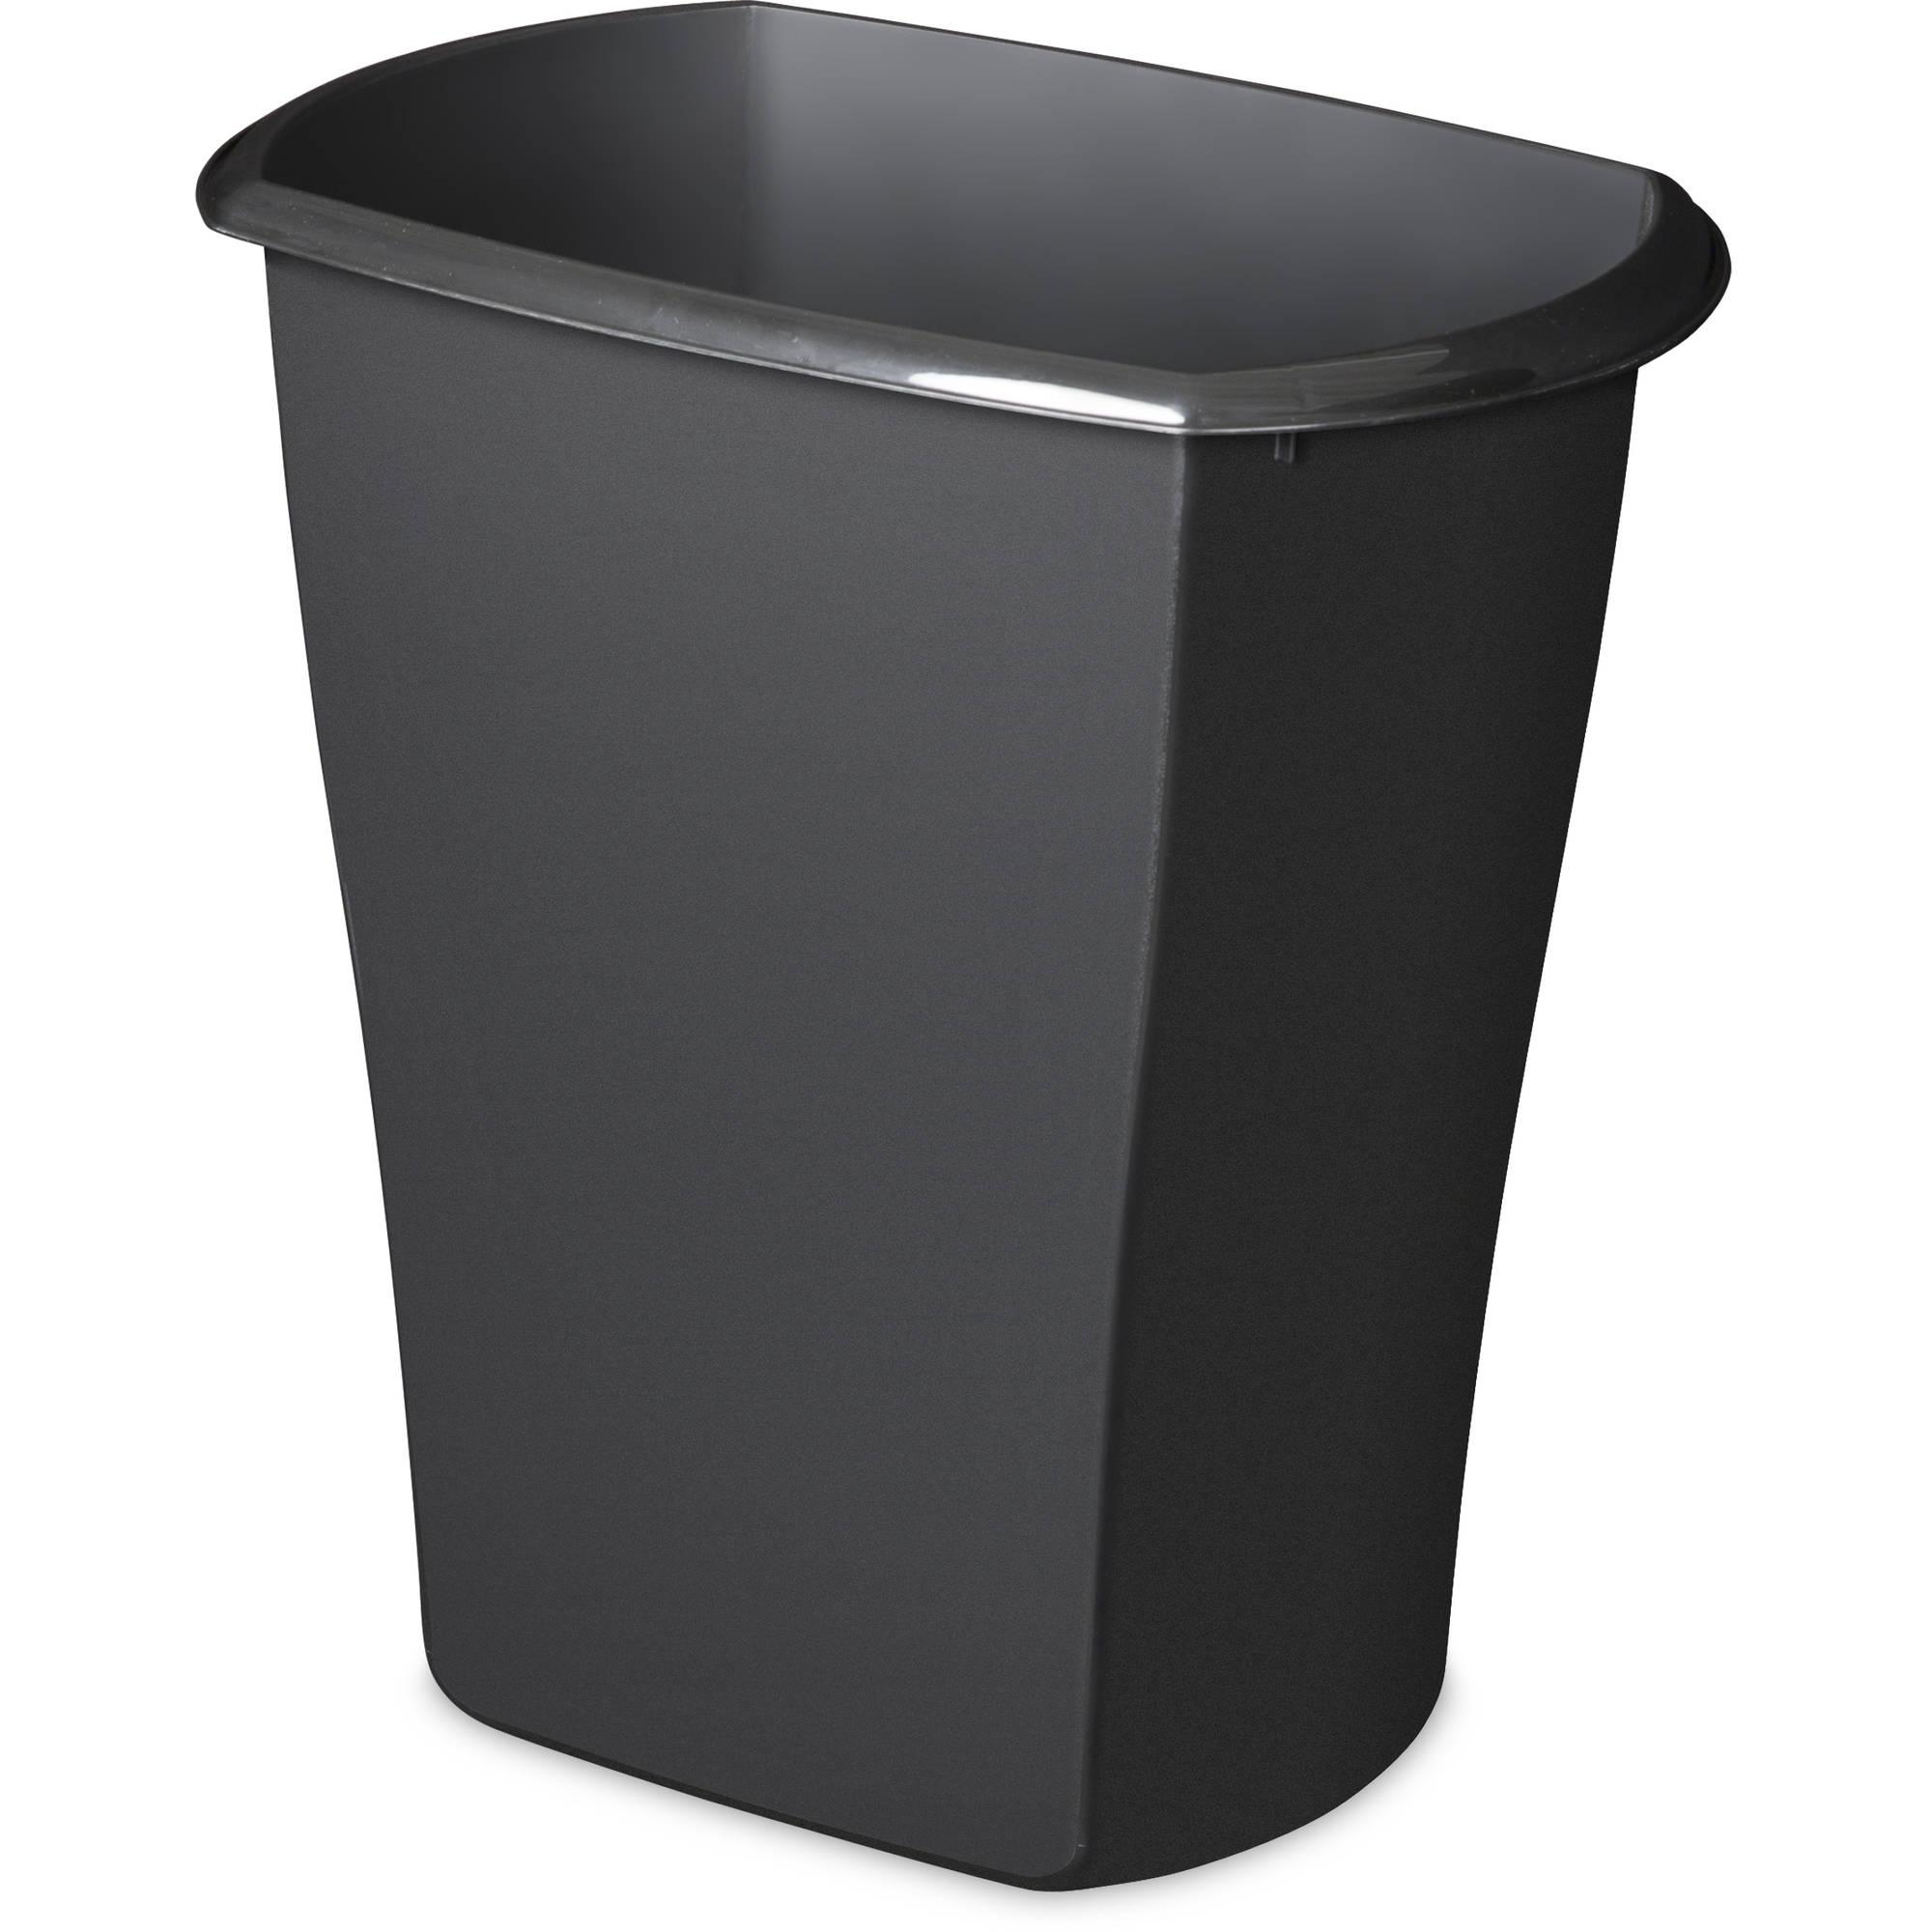 Sterilite 5.5 Gal Open Wastebasket, Black